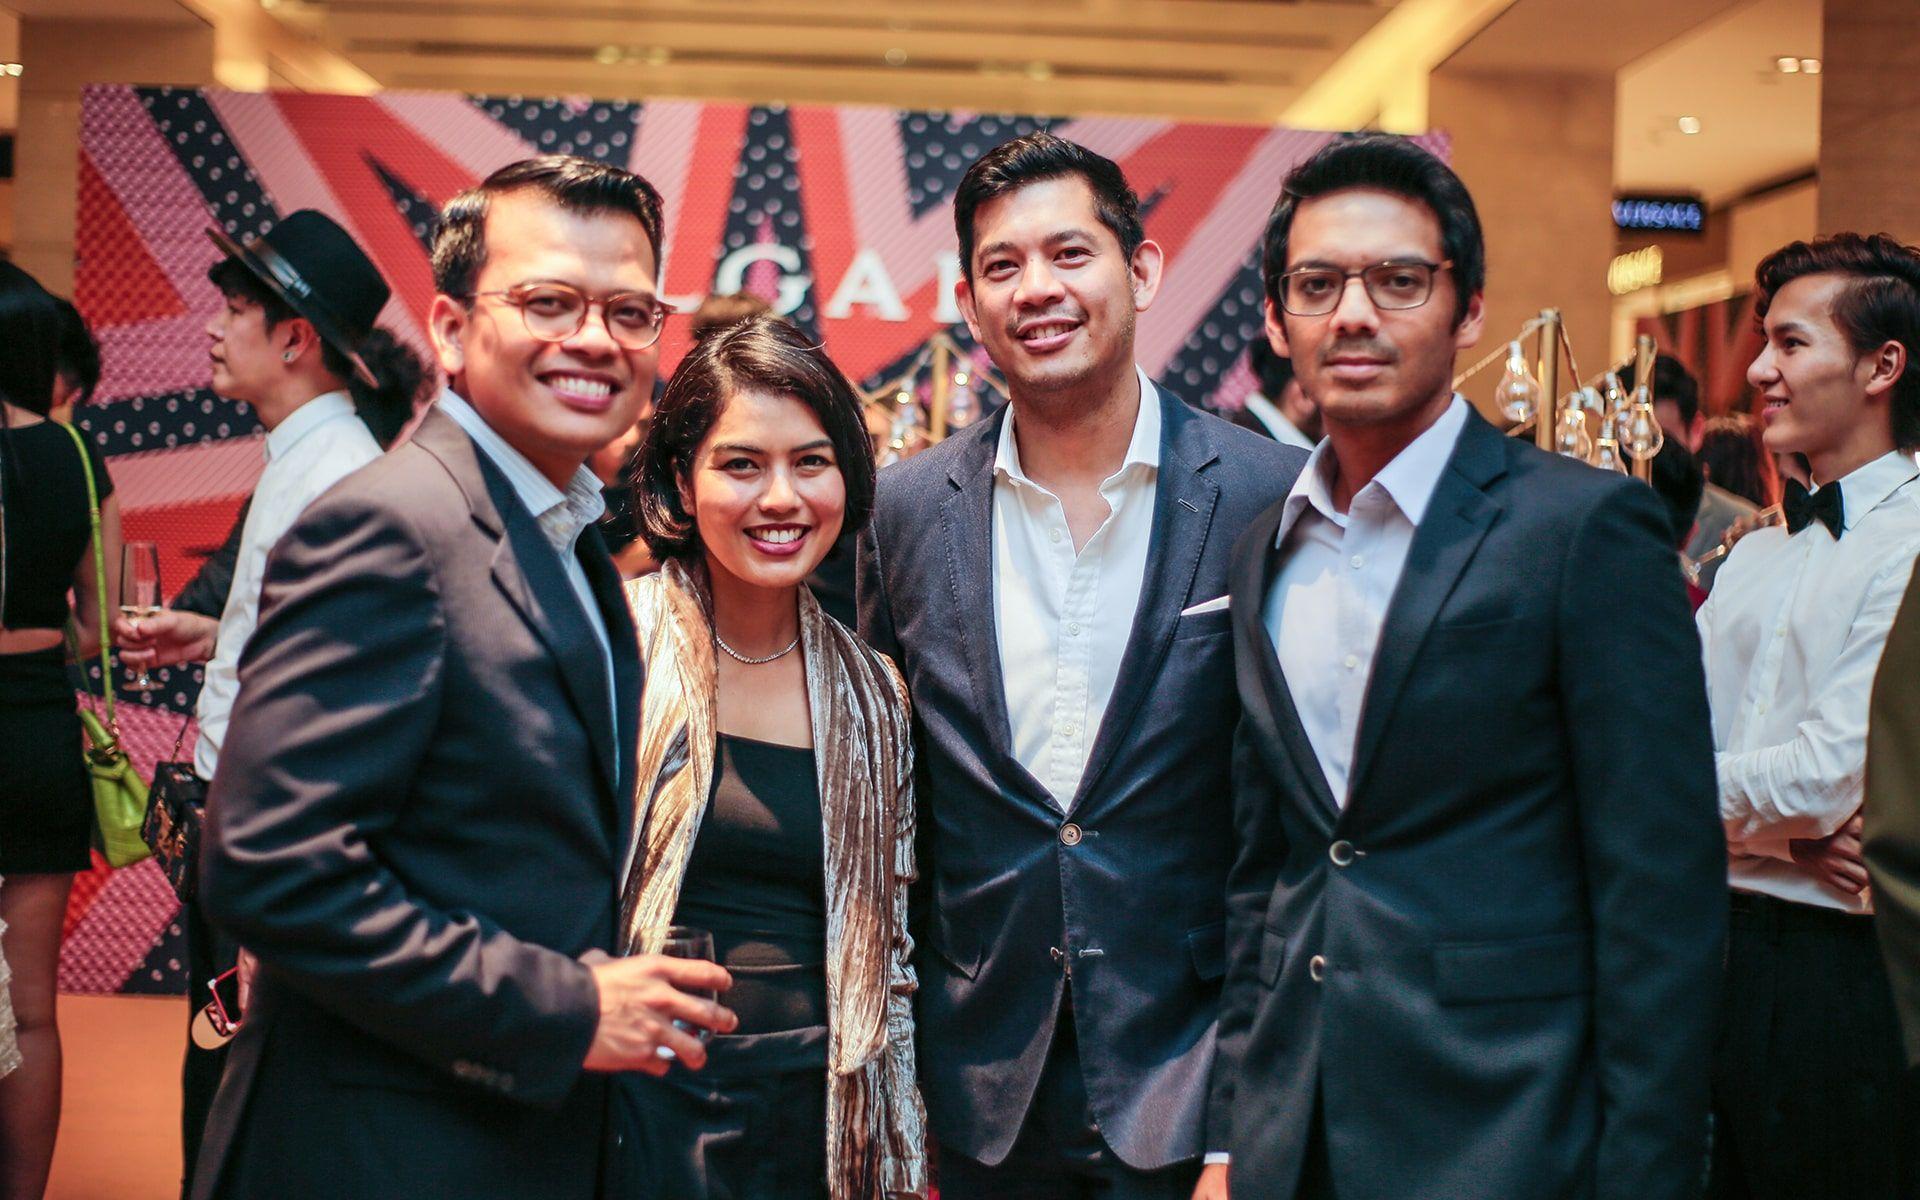 Khairul Rifaei, Azura Abdul Rahman, Shazlan Sufian and Firhan Yasser